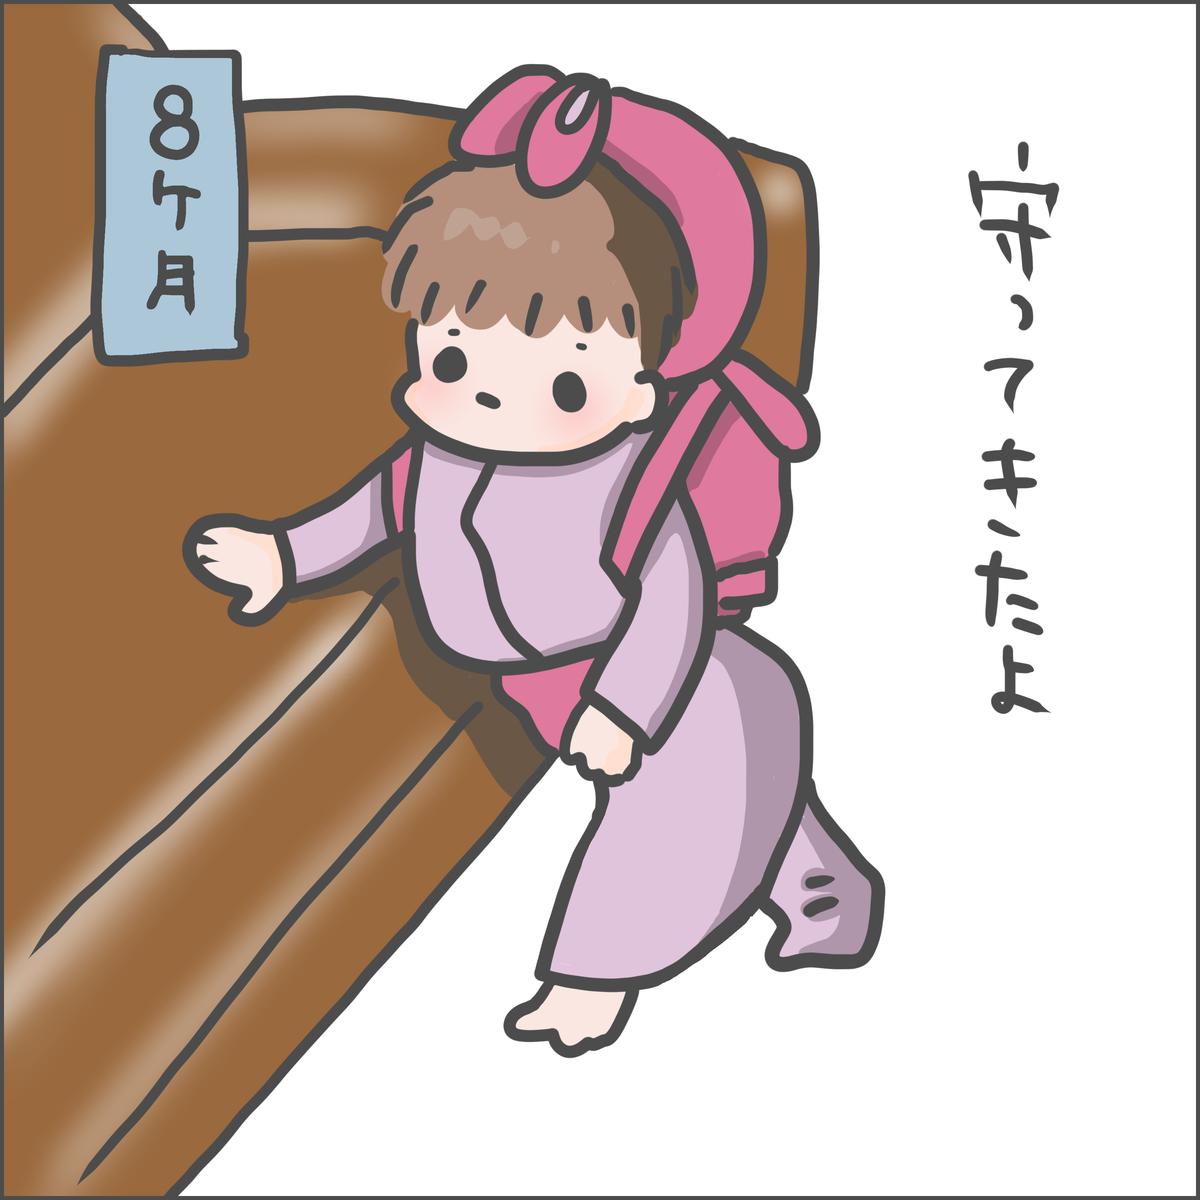 f:id:ika_yoshi:20201206005642j:plain